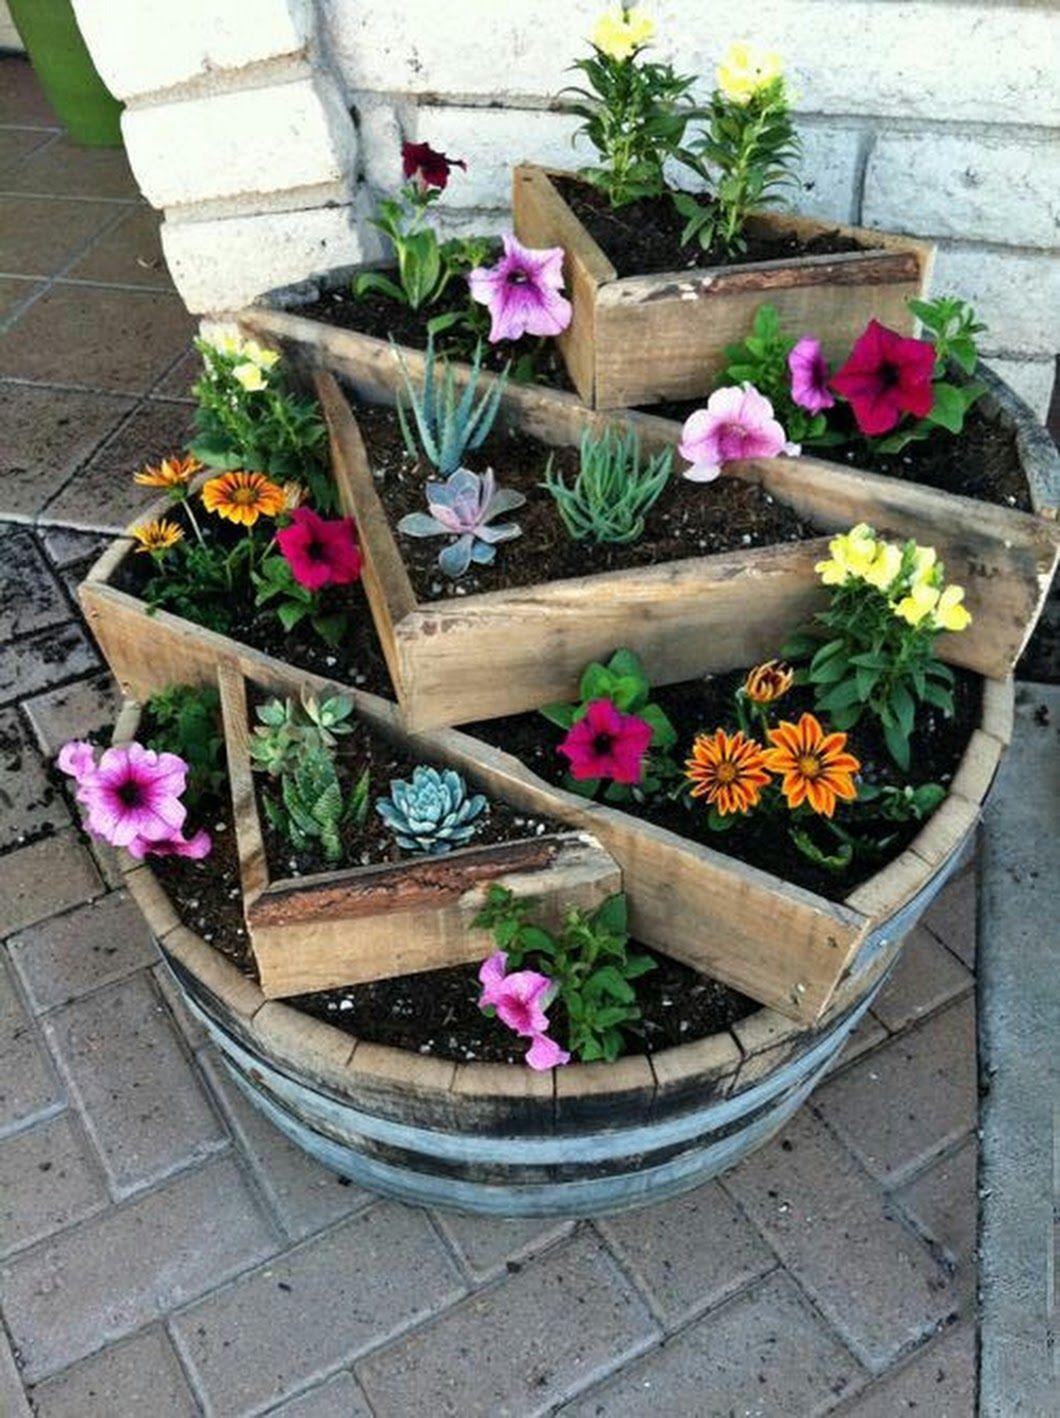 Whiskey barrel garden ideas easy craft ideas abril dorado google jardines pinterest carport patio whiskey barrel planter sisterspd